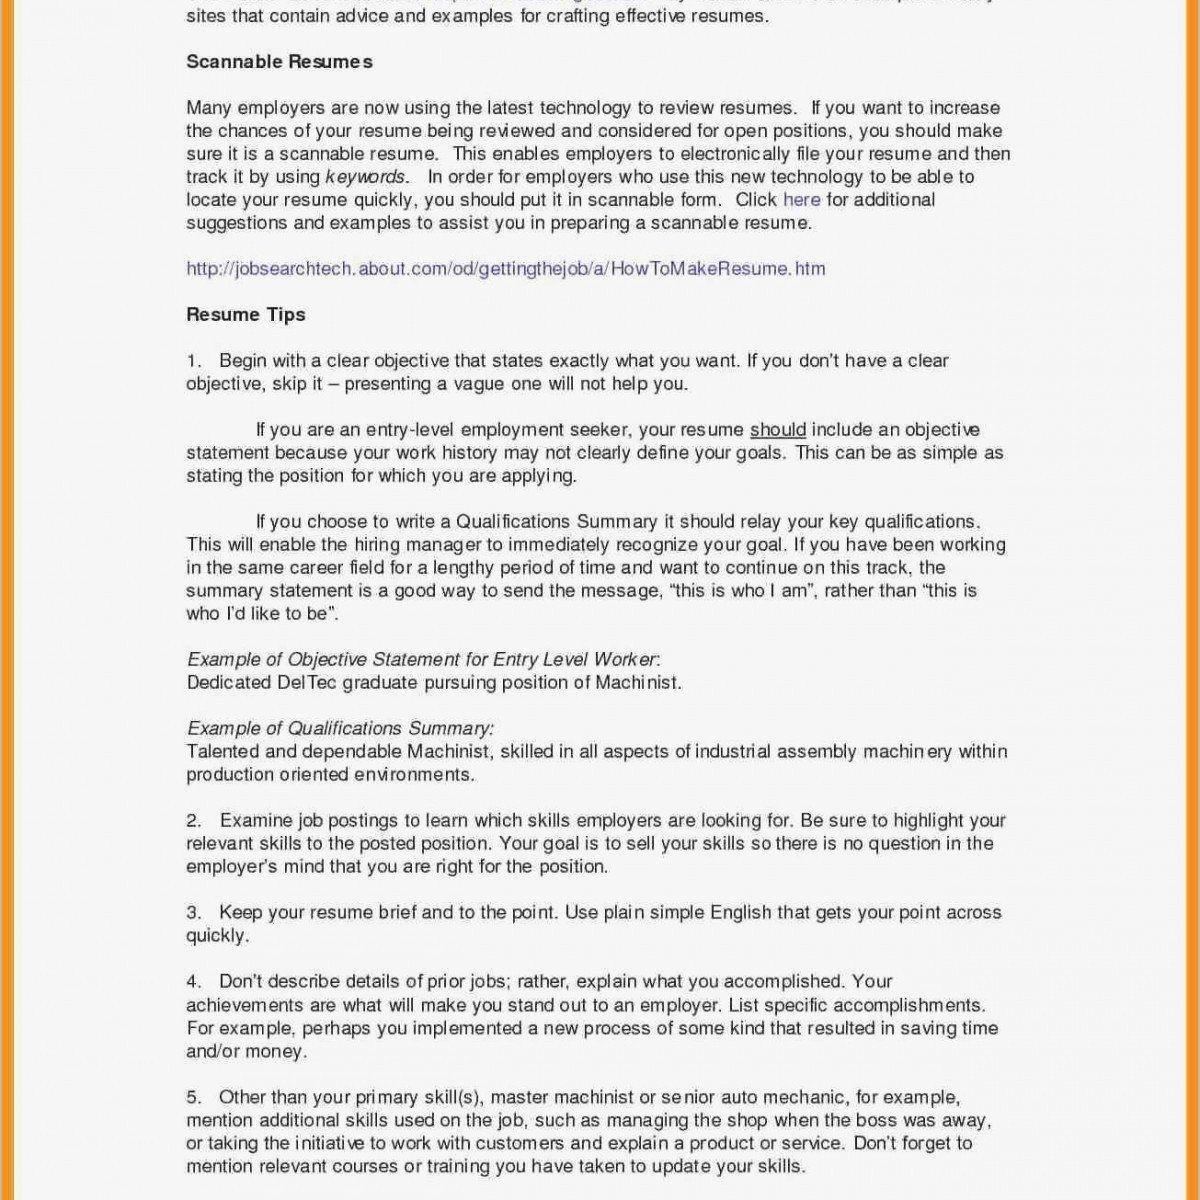 Resume for Masters Degree Fresh Graduate School Resume